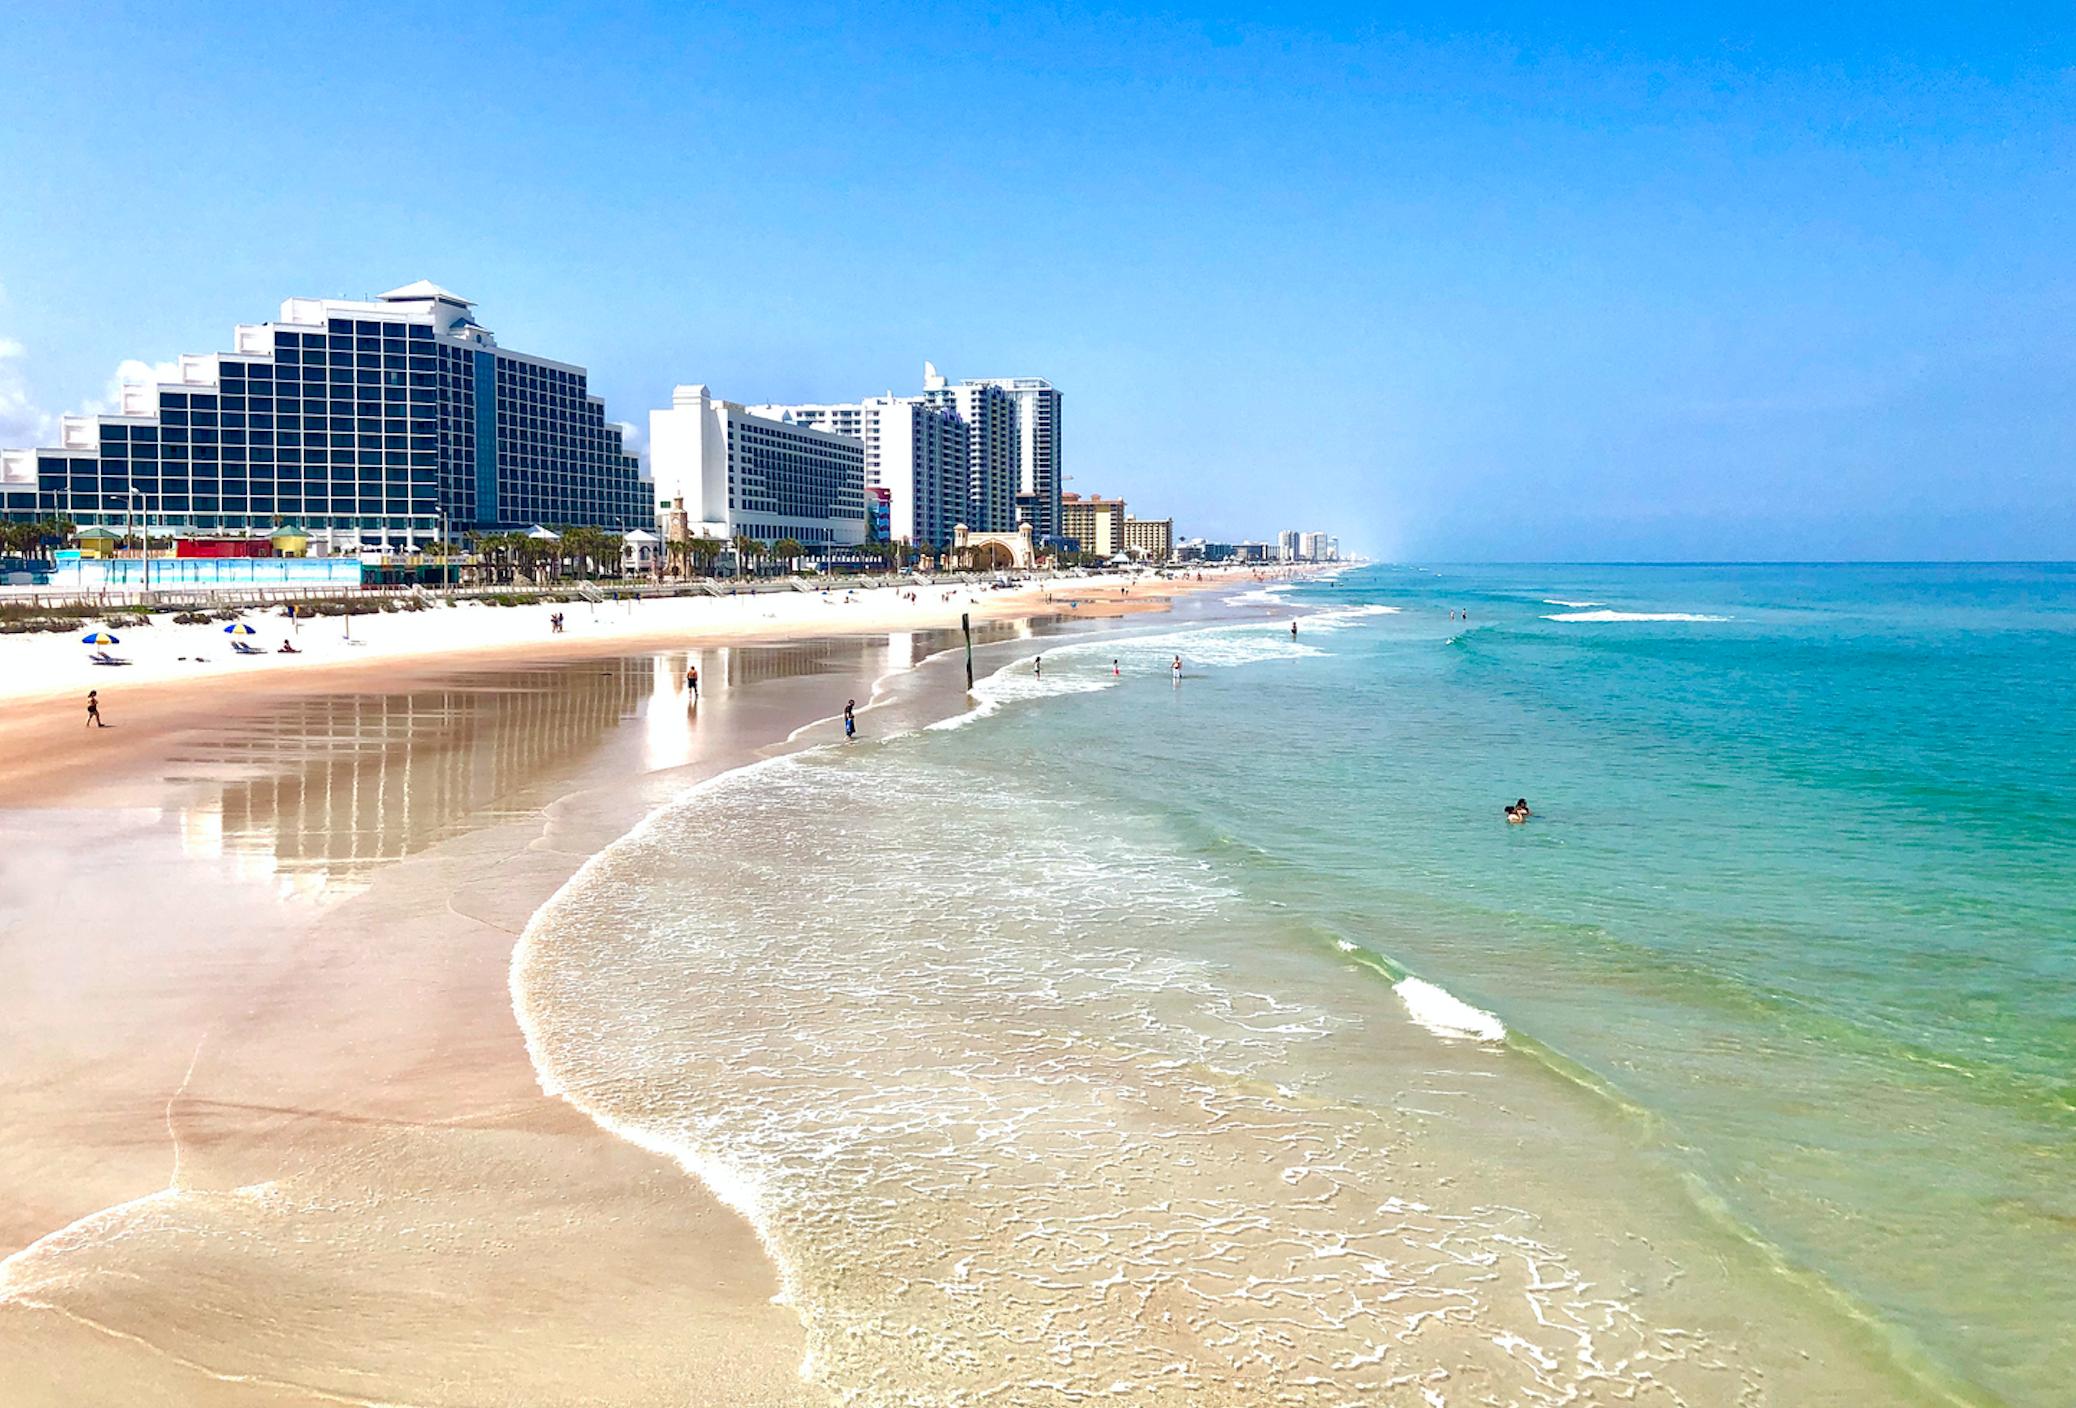 Free & cheap things to do in Daytona Beach: image of beautiful beach shoes and hotels at Daytona Beach, Florida just a short drive from Orlando